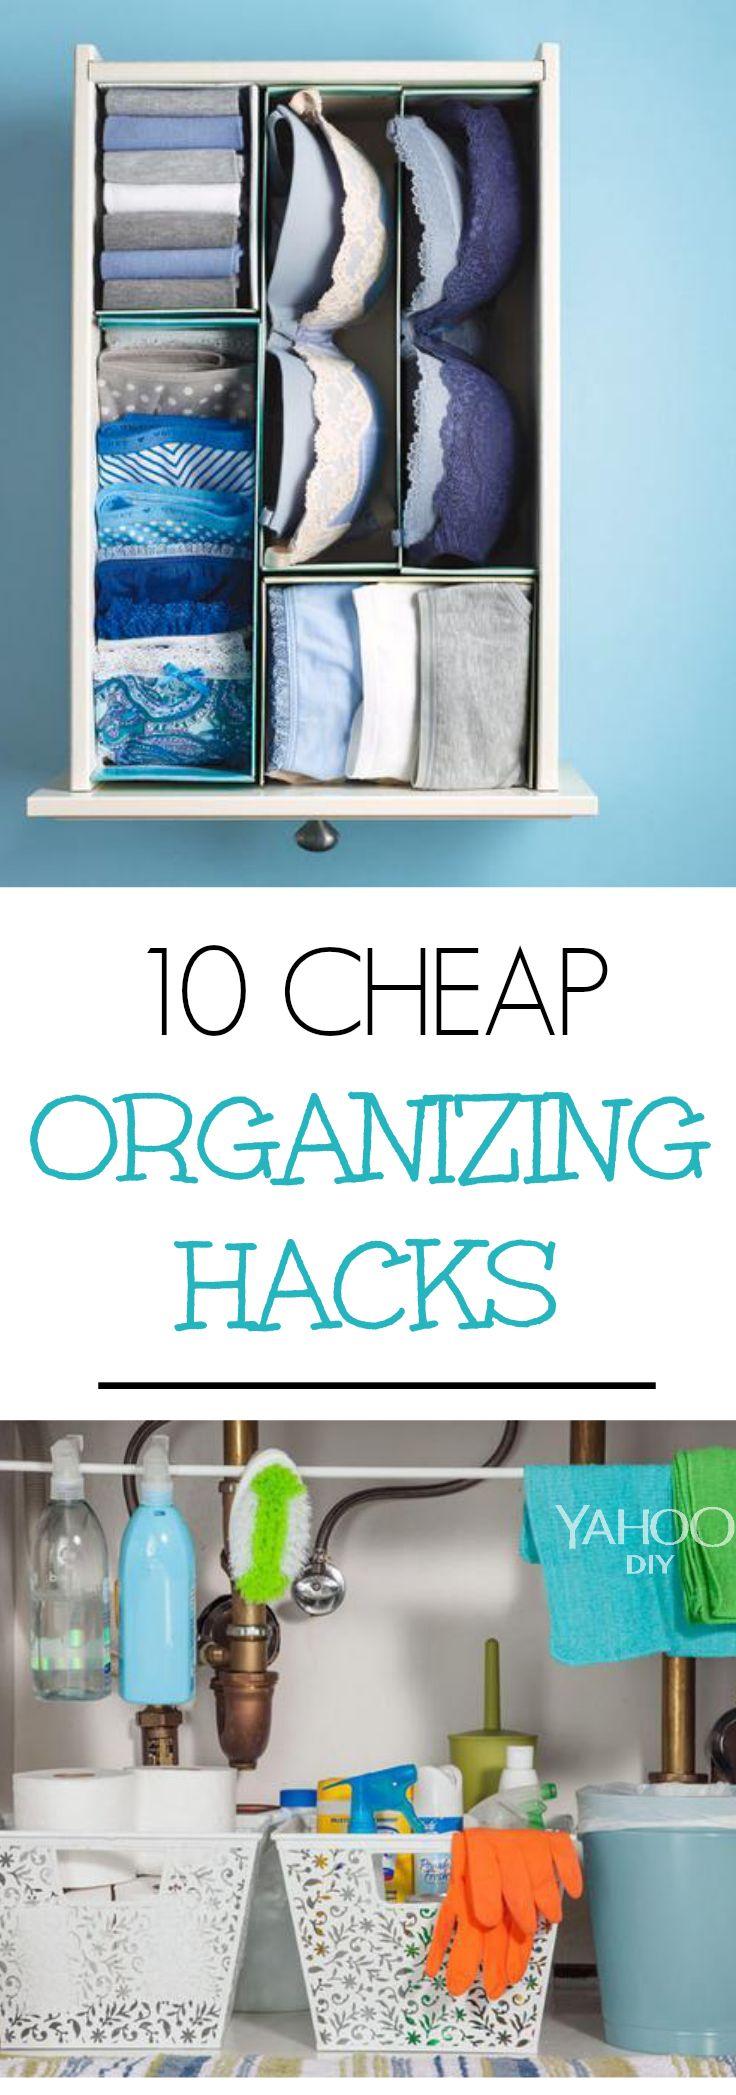 10 cheap organizing hacks diy projects pinterest amerika ordnung schaffen und geschafft. Black Bedroom Furniture Sets. Home Design Ideas